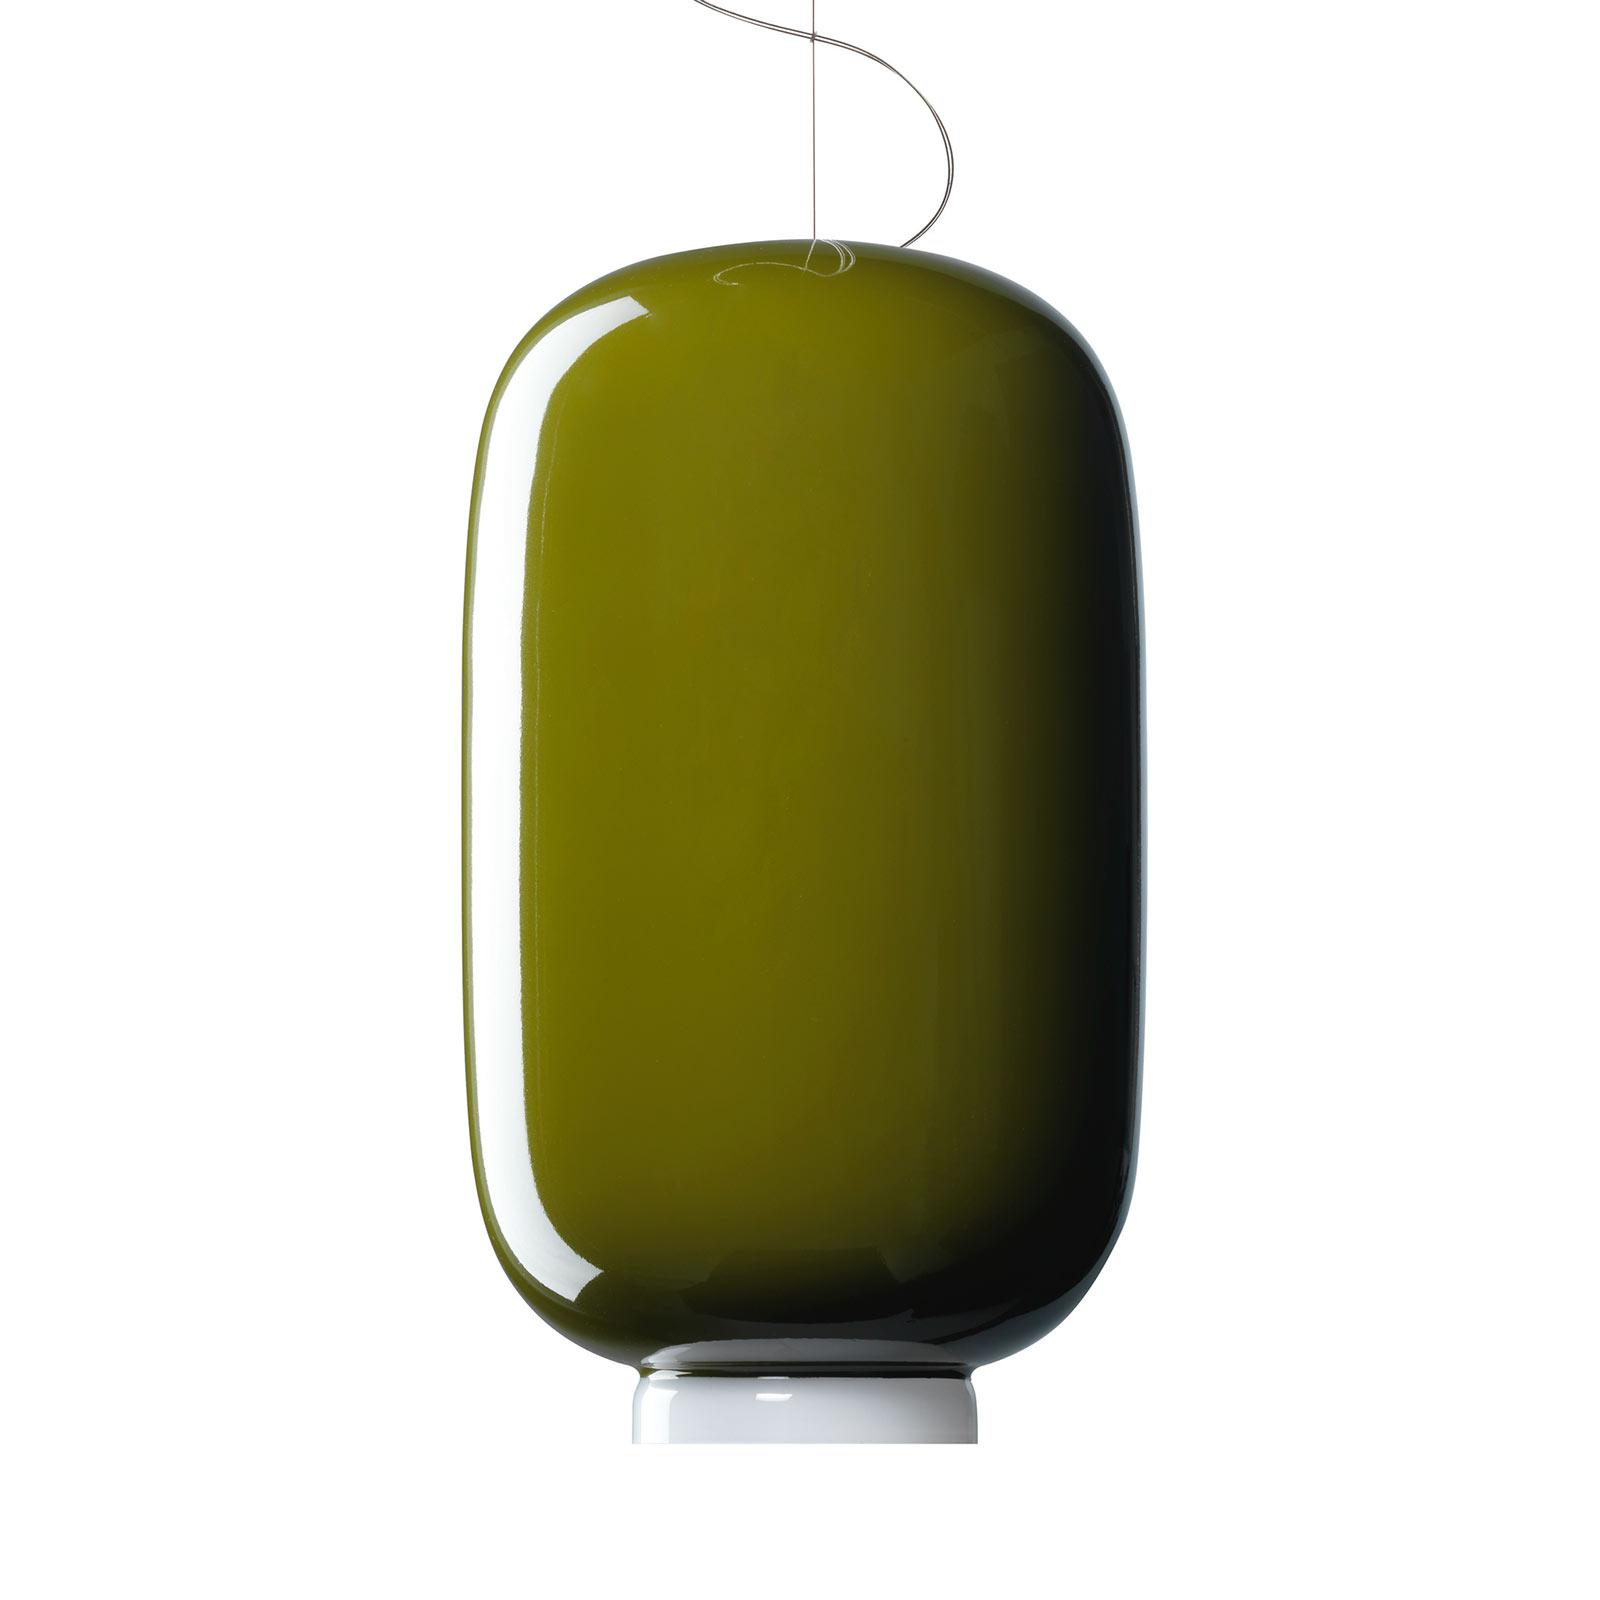 Foscarini Chouchin 2 sospensione LED, verde